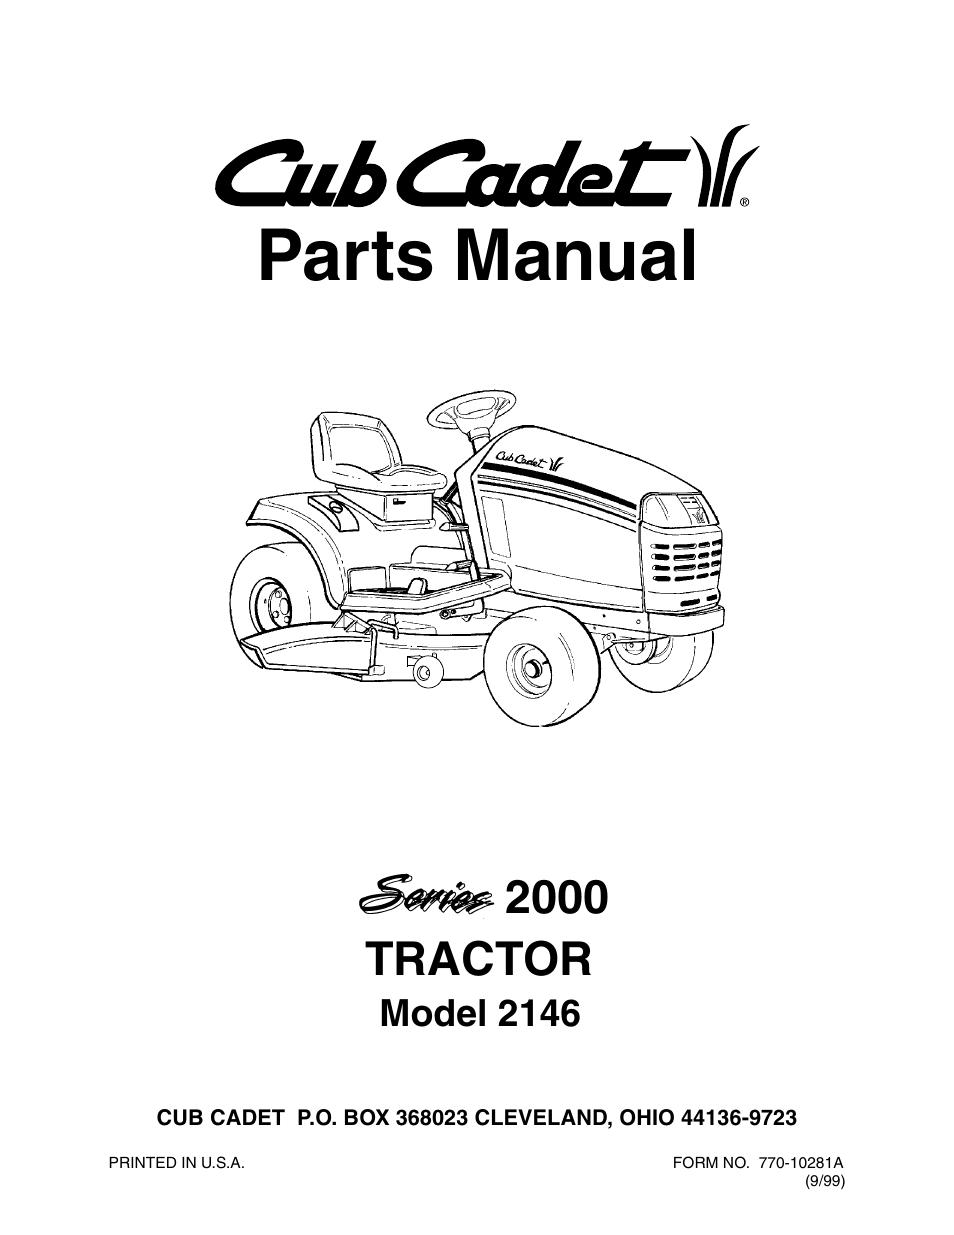 cub cadet series 2000 parts manual car owners manual